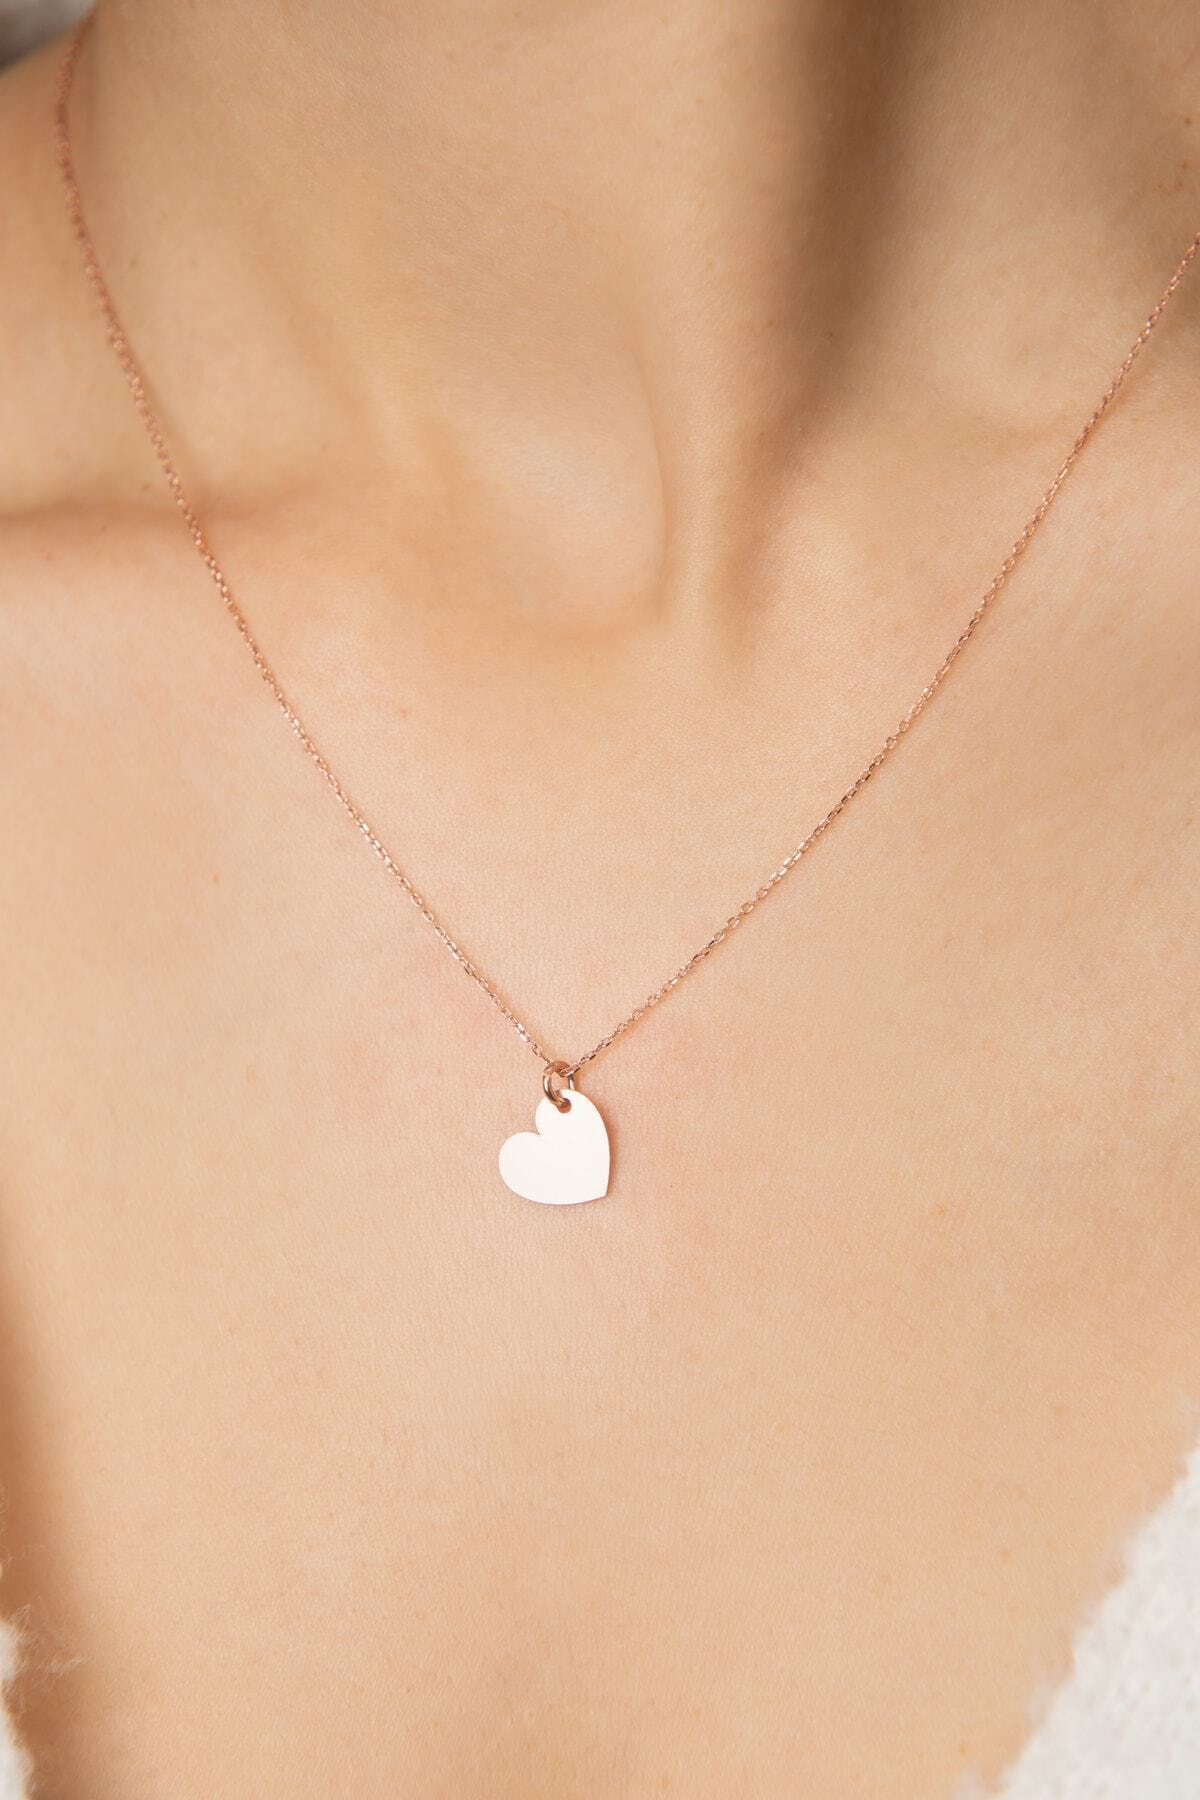 Papatya Silver Kadın Kalp Model 925 Ayar Gümüş Kolye 1